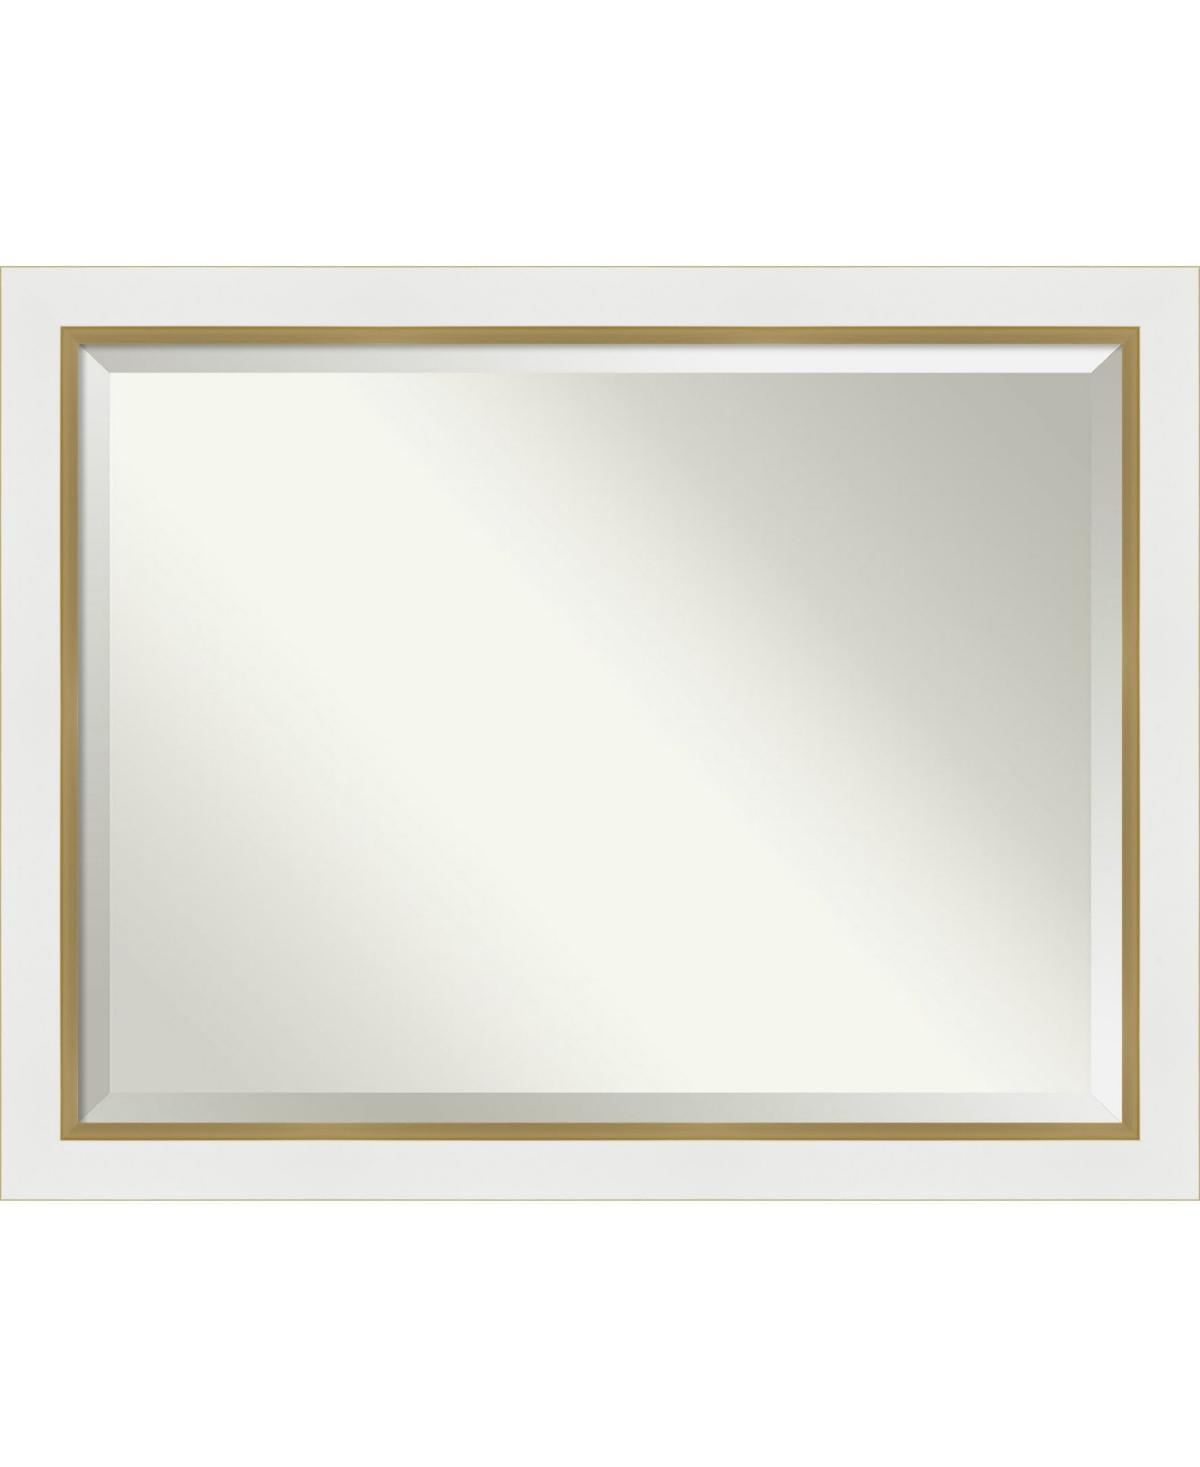 Amanti Art Eva Gold-tone Framed Bathroom Vanity Wall Mirror, 45.25